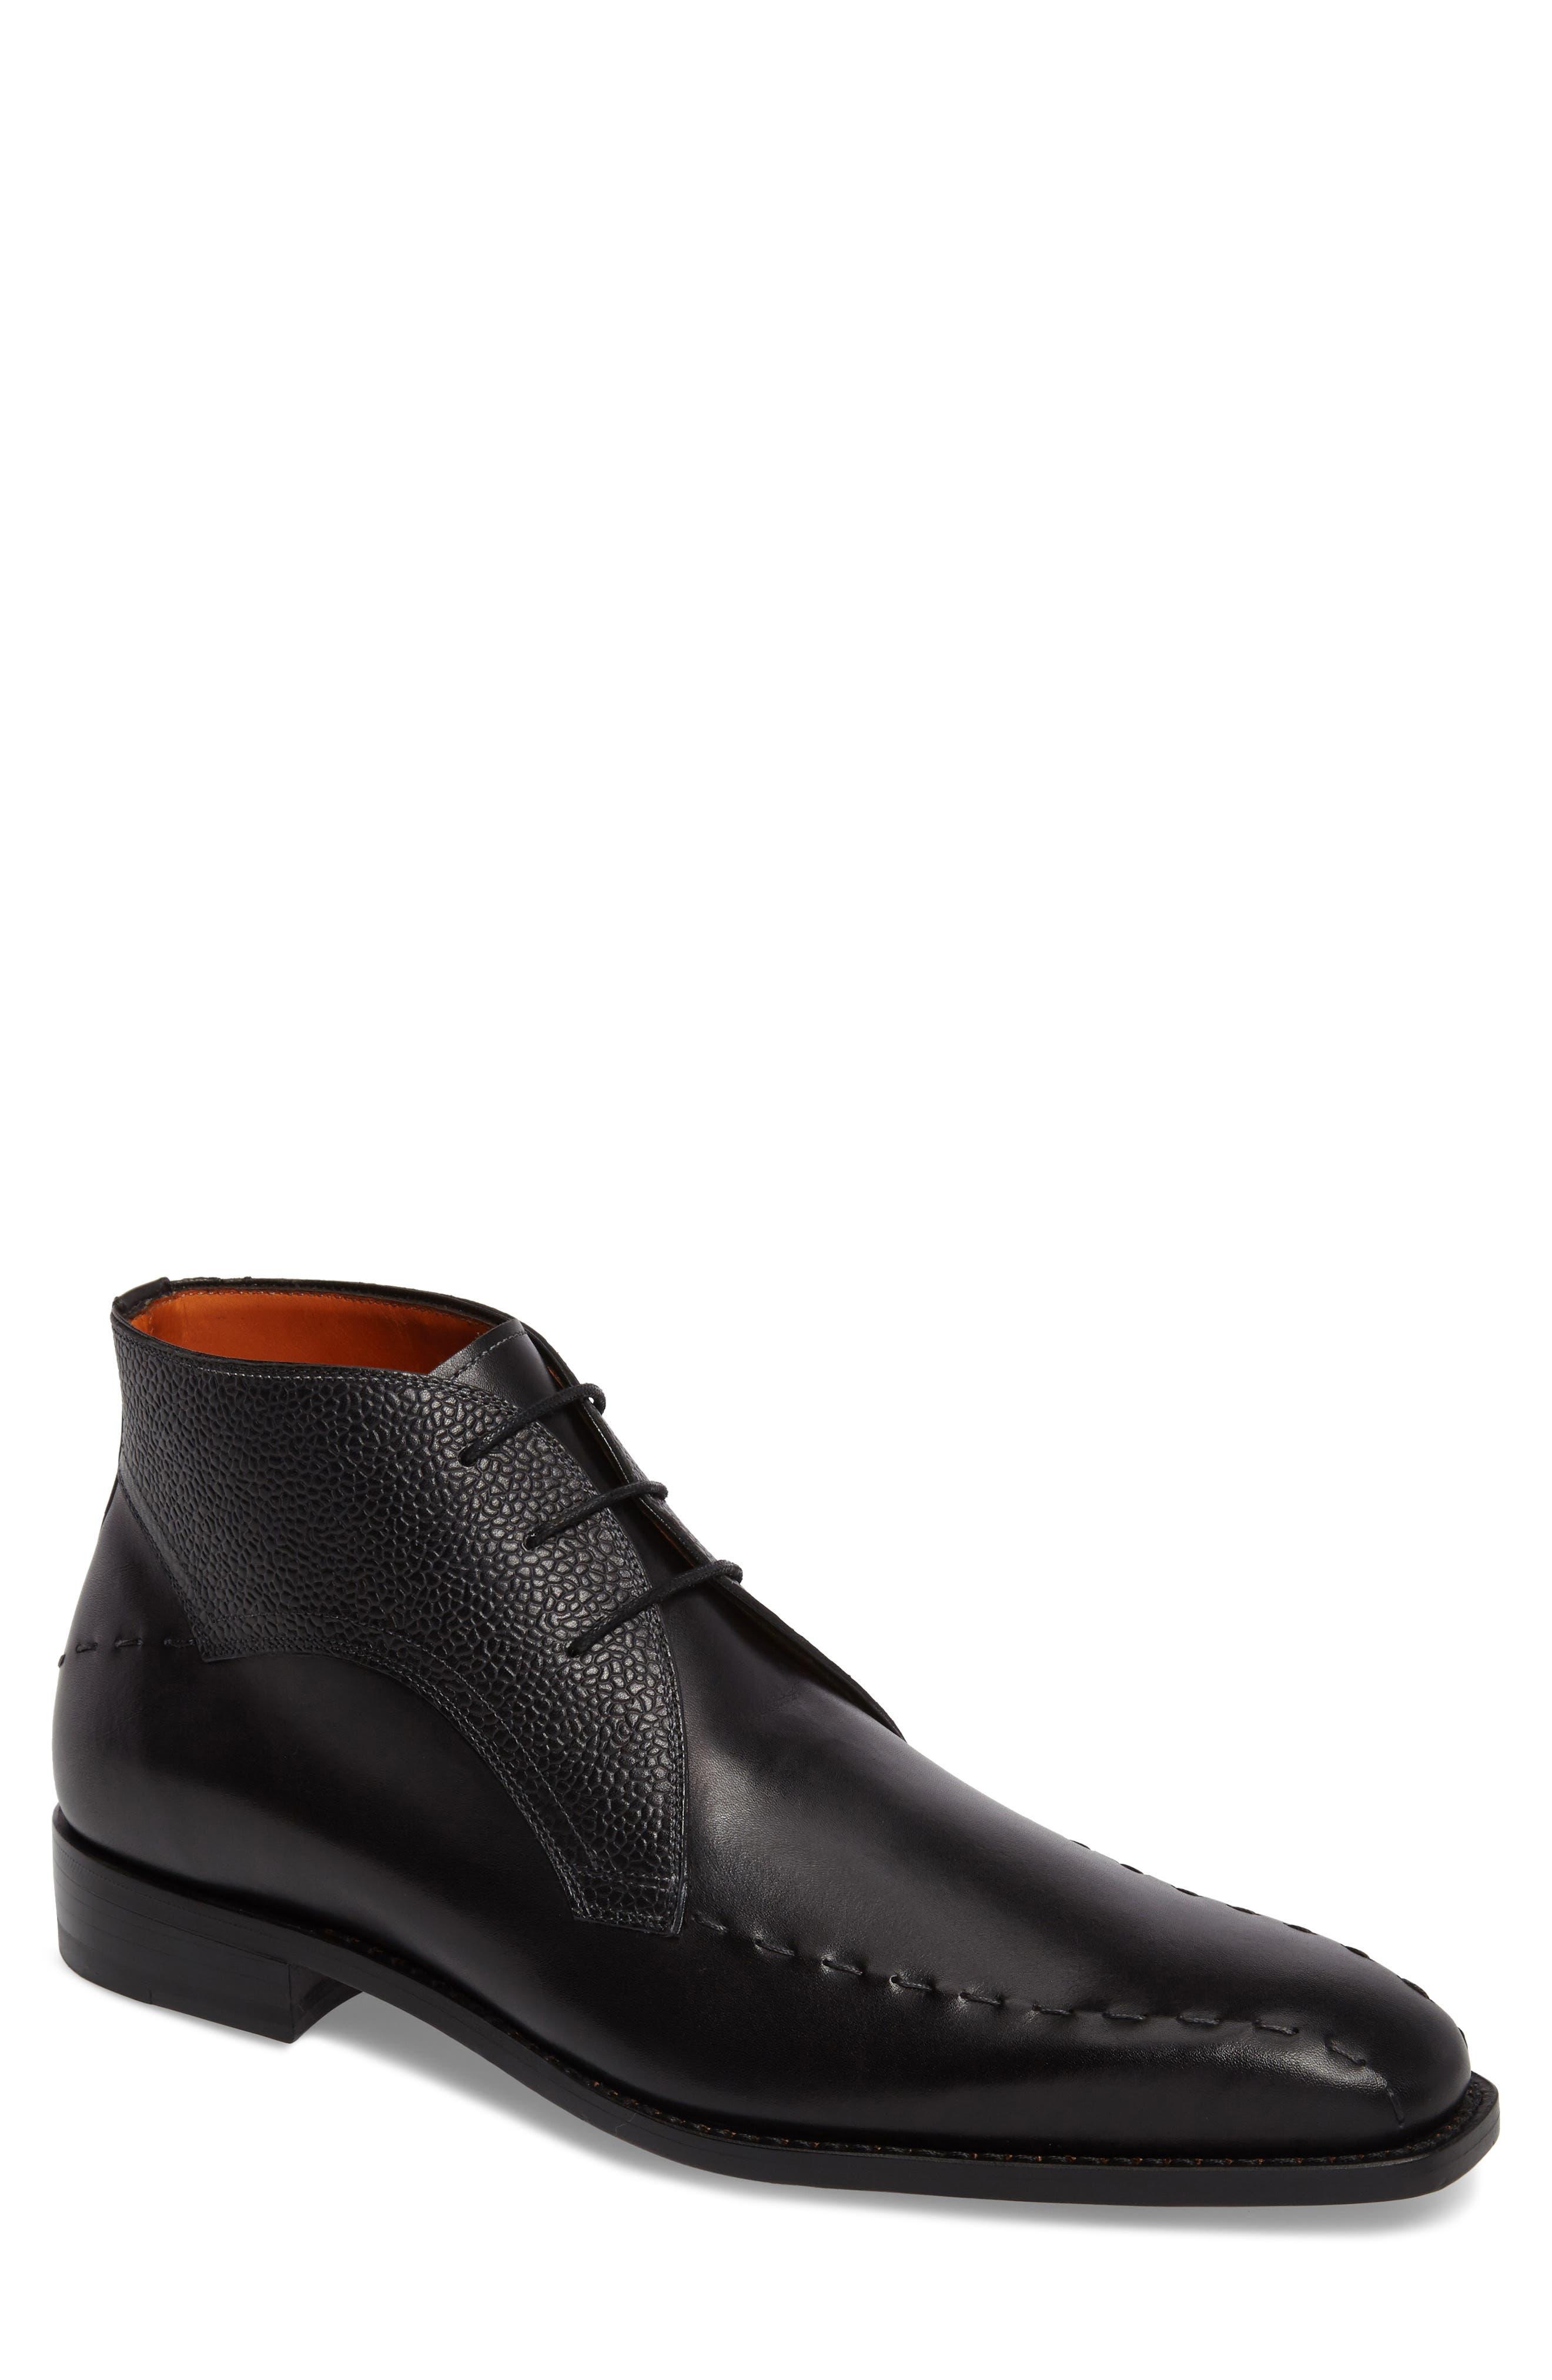 Moriles Chukka Boot,                         Main,                         color, 001